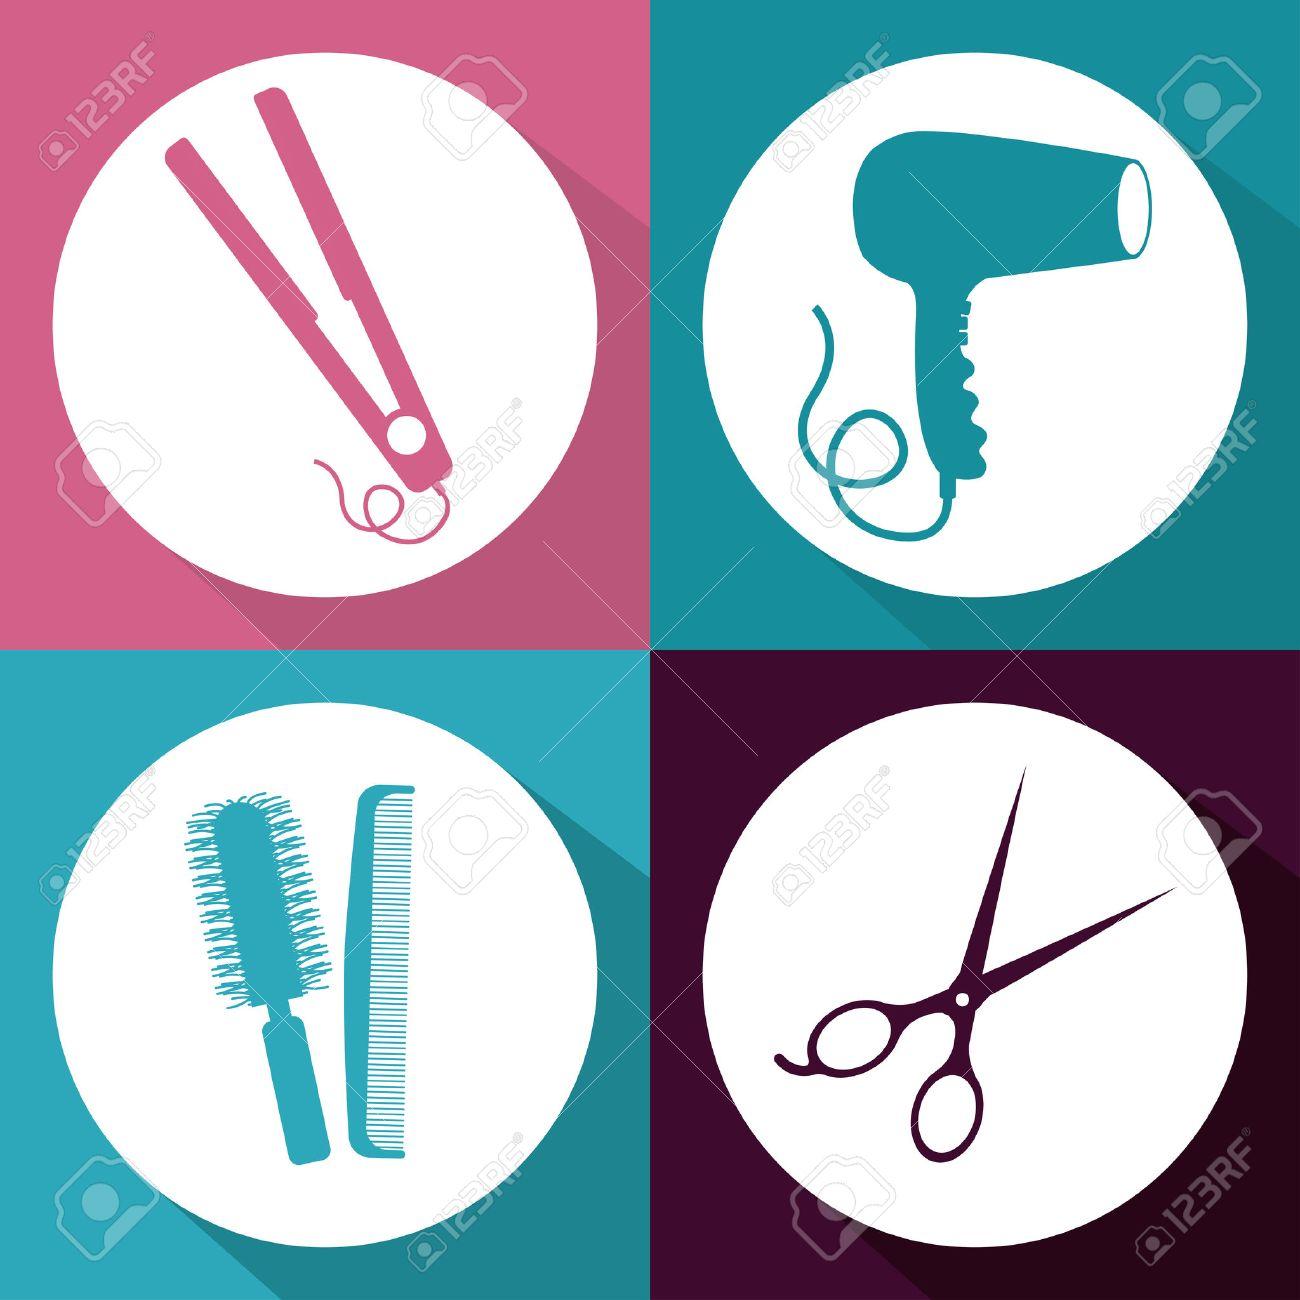 Hair Salon design over multicolored background, vector illustration - 38243111